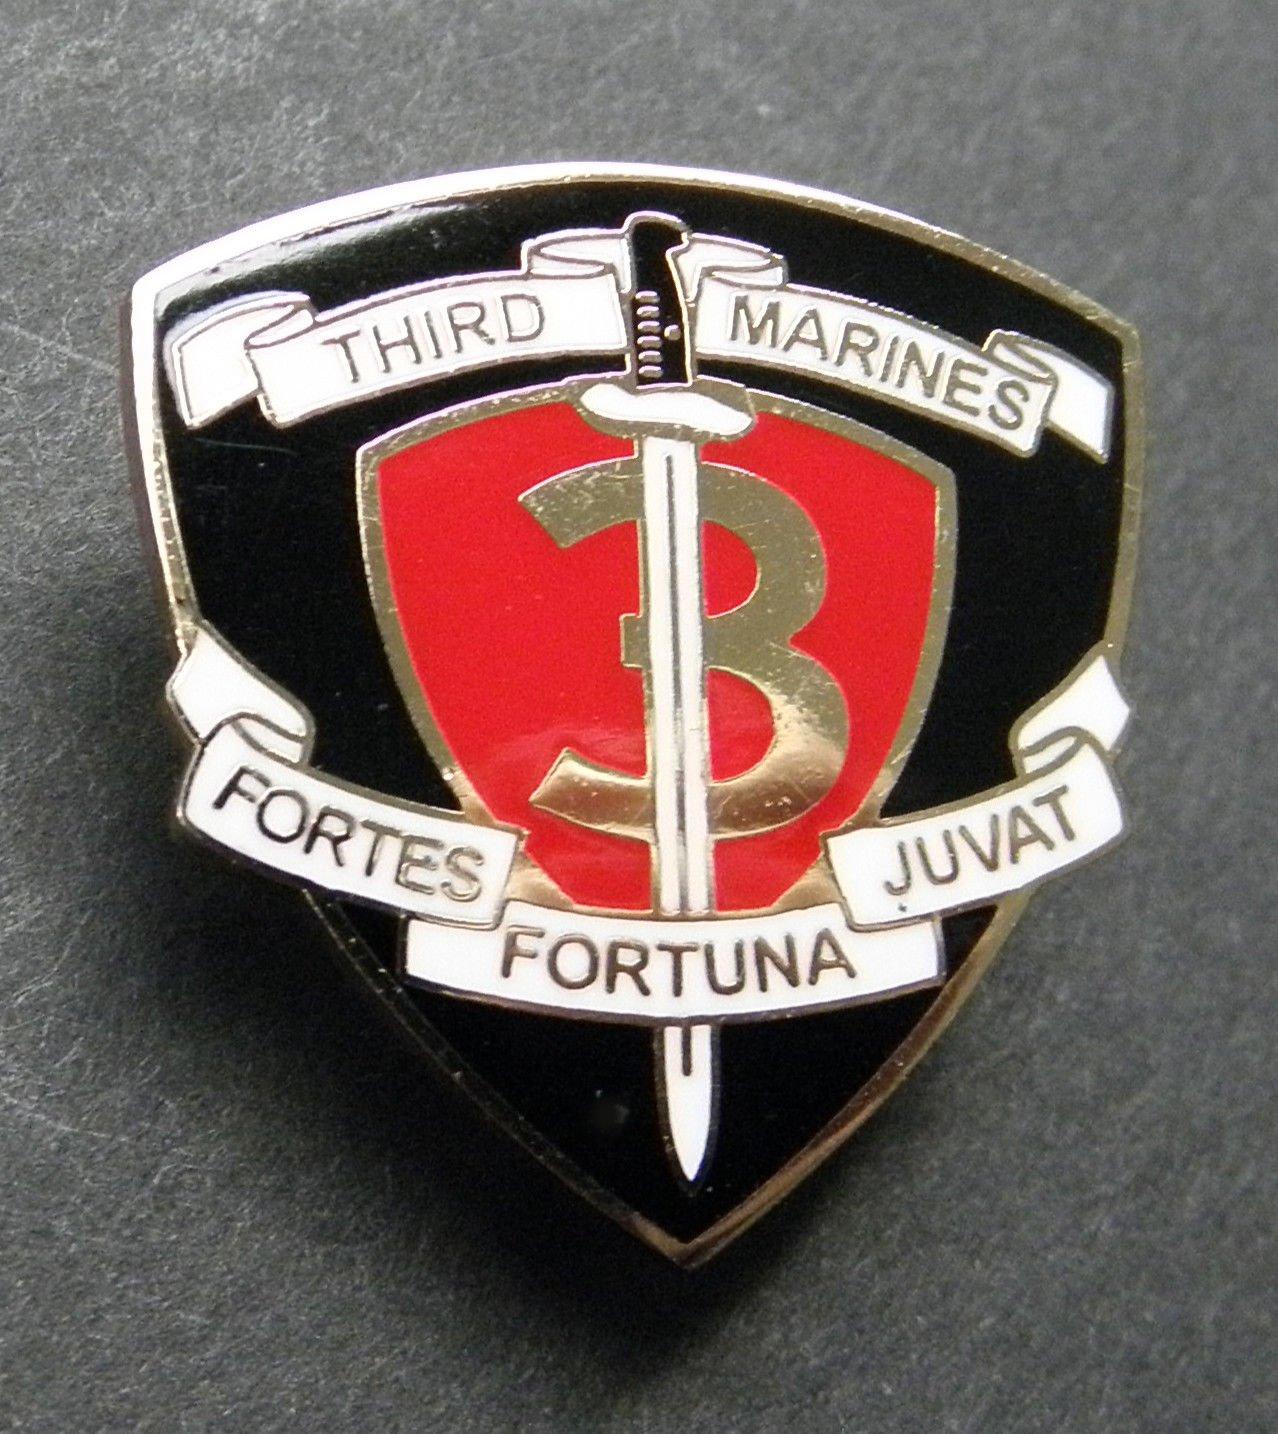 Third Marines 3Rd Marine Infantry Regiment Fortes Fortuna Juvat Lapel Pin 1 Inch